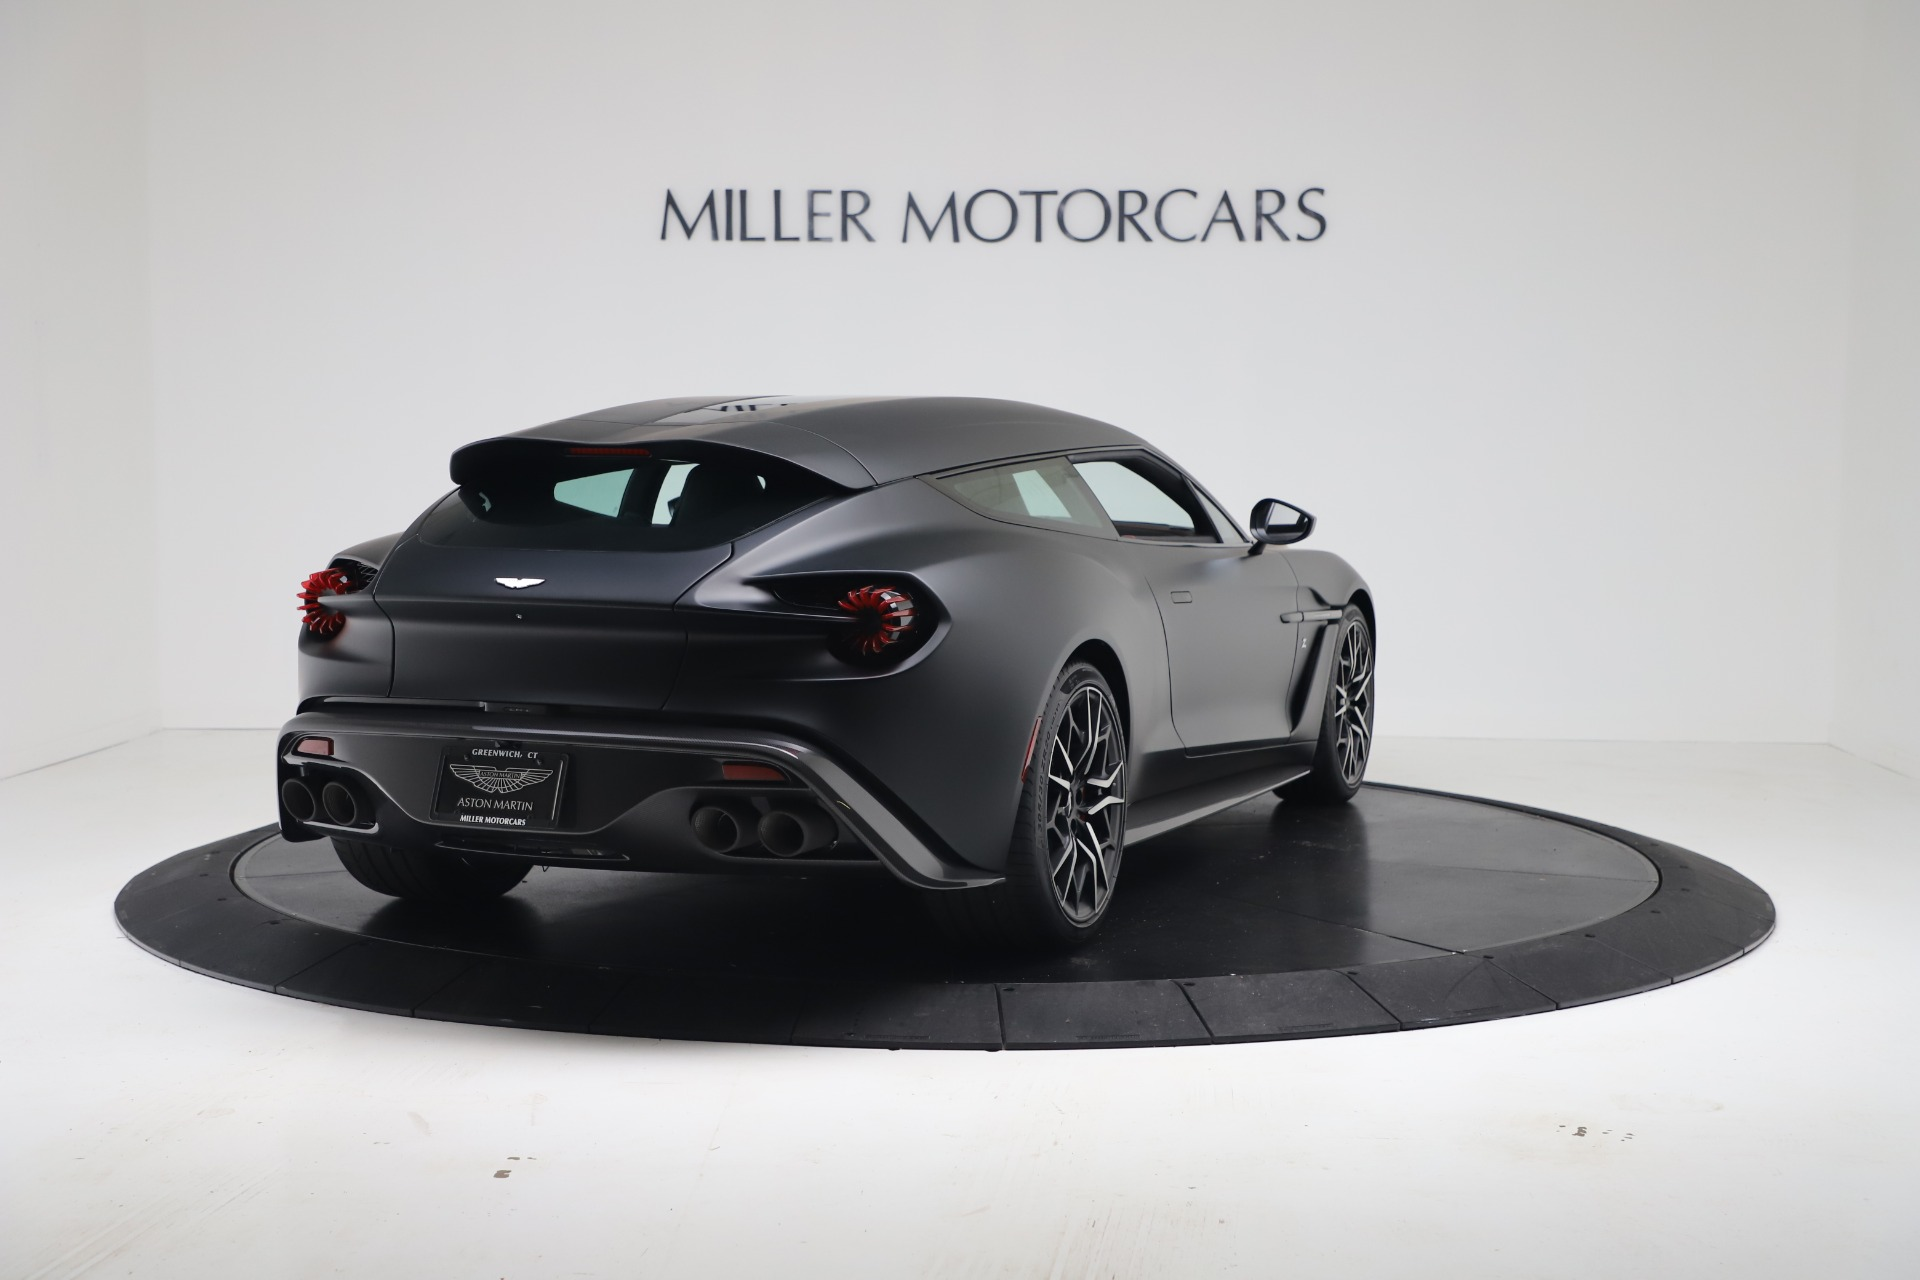 New 2019 Aston Martin Vanquish Zagato Shooting Brake For Sale 909 871 Aston Martin Of Greenwich Stock 7664c